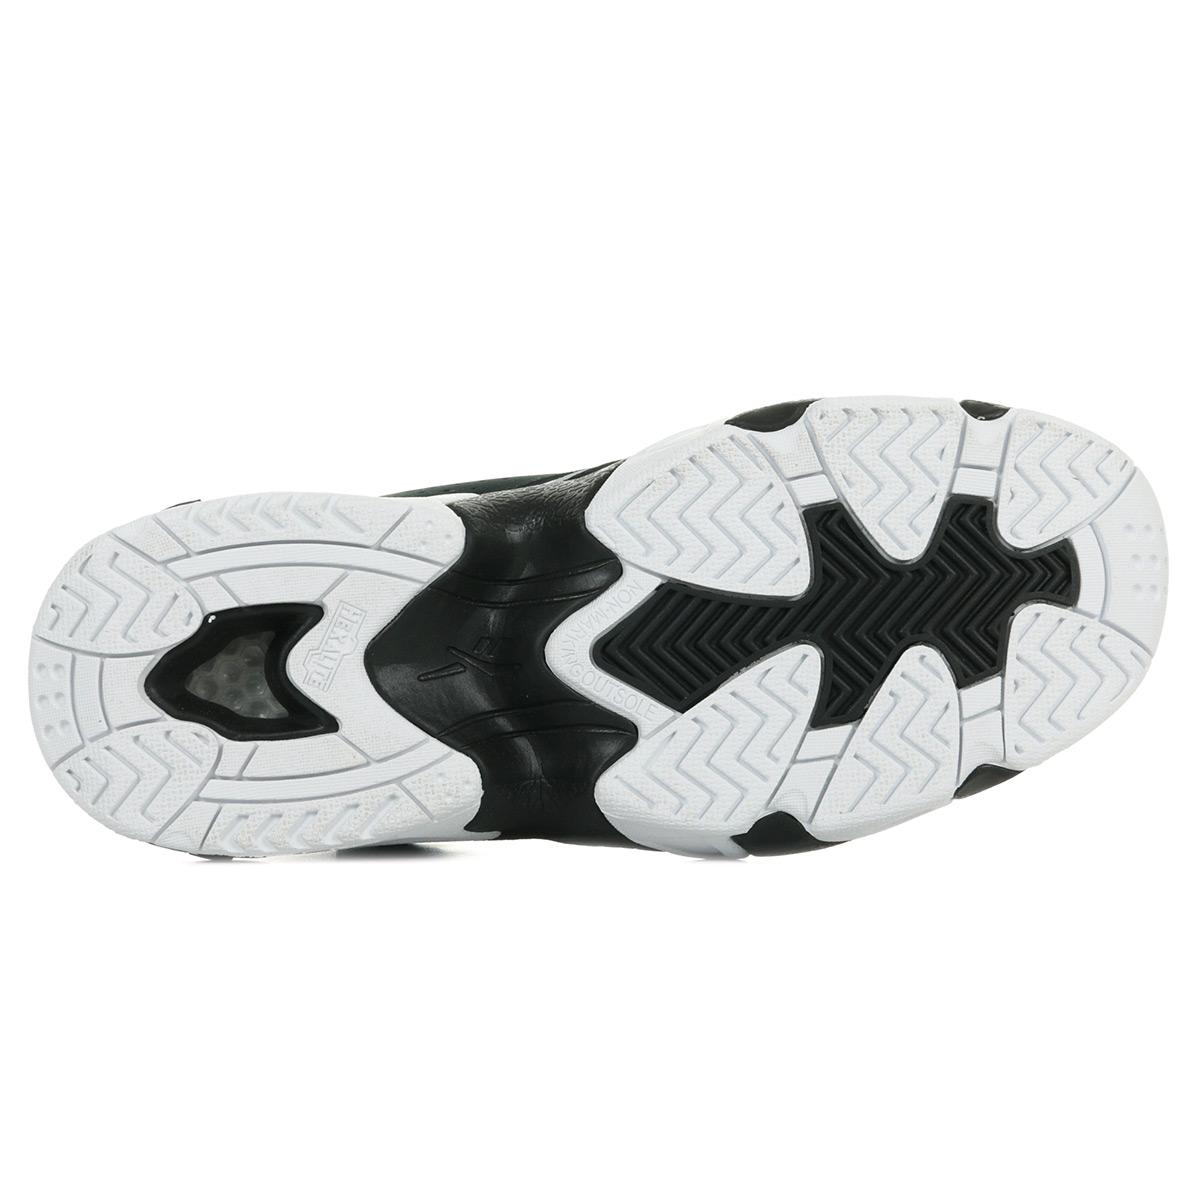 taille chaussure taille usine 23 23 reebok reebok usine chaussure gyf7b6